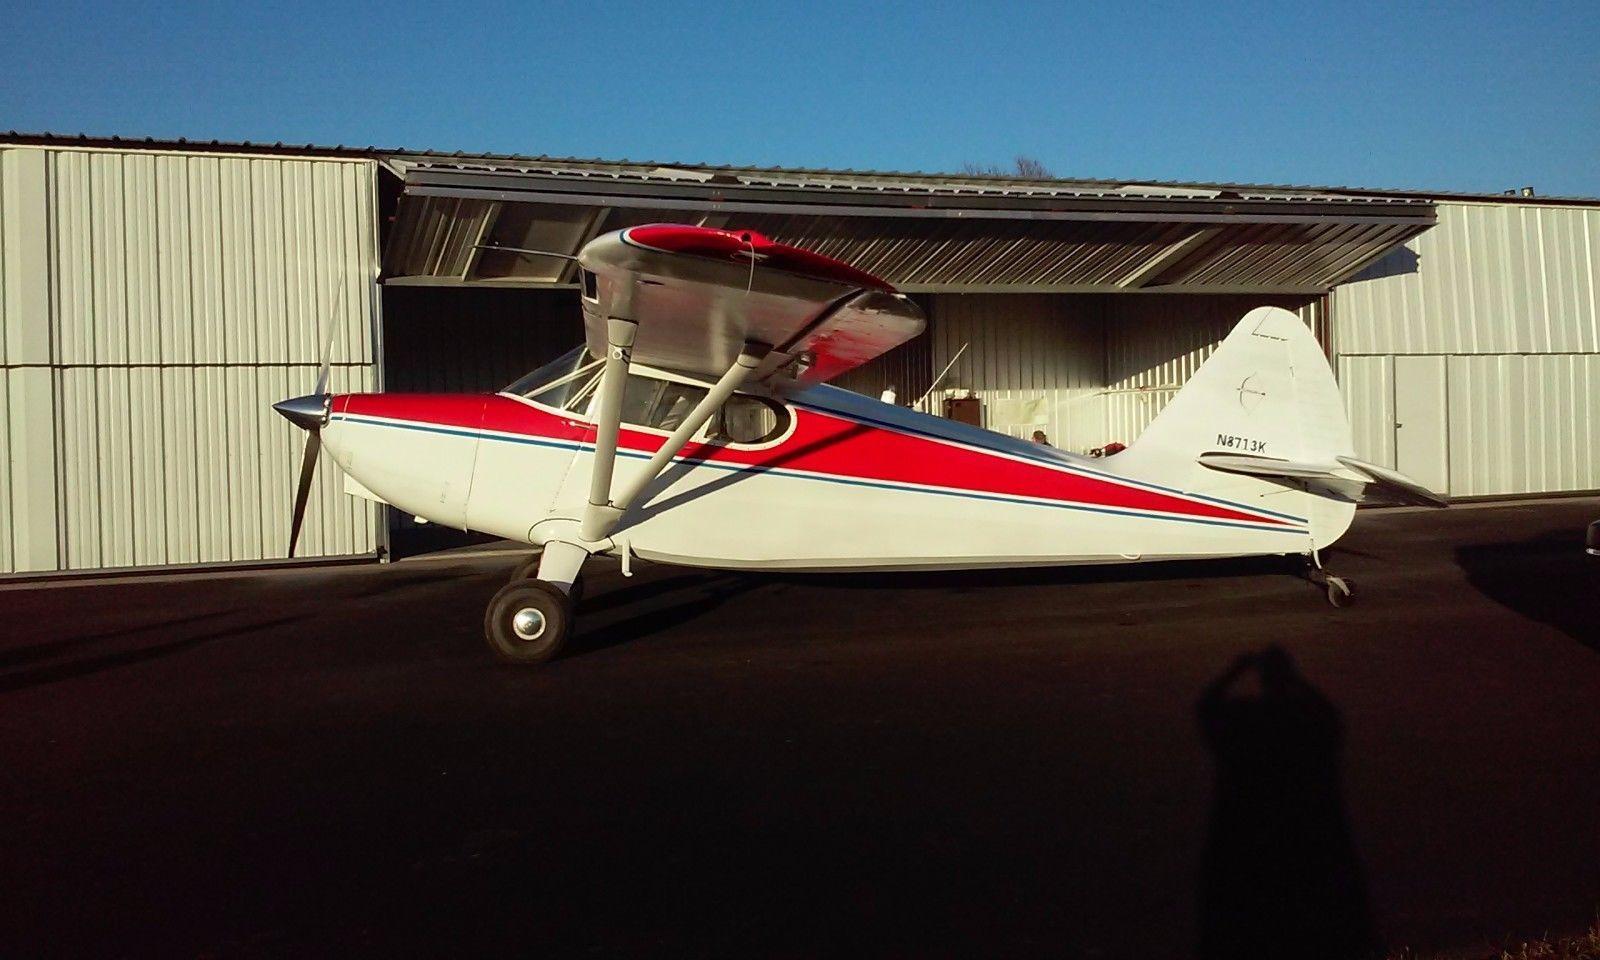 restored 1947 Stinson Voyager 108-1 aircraft